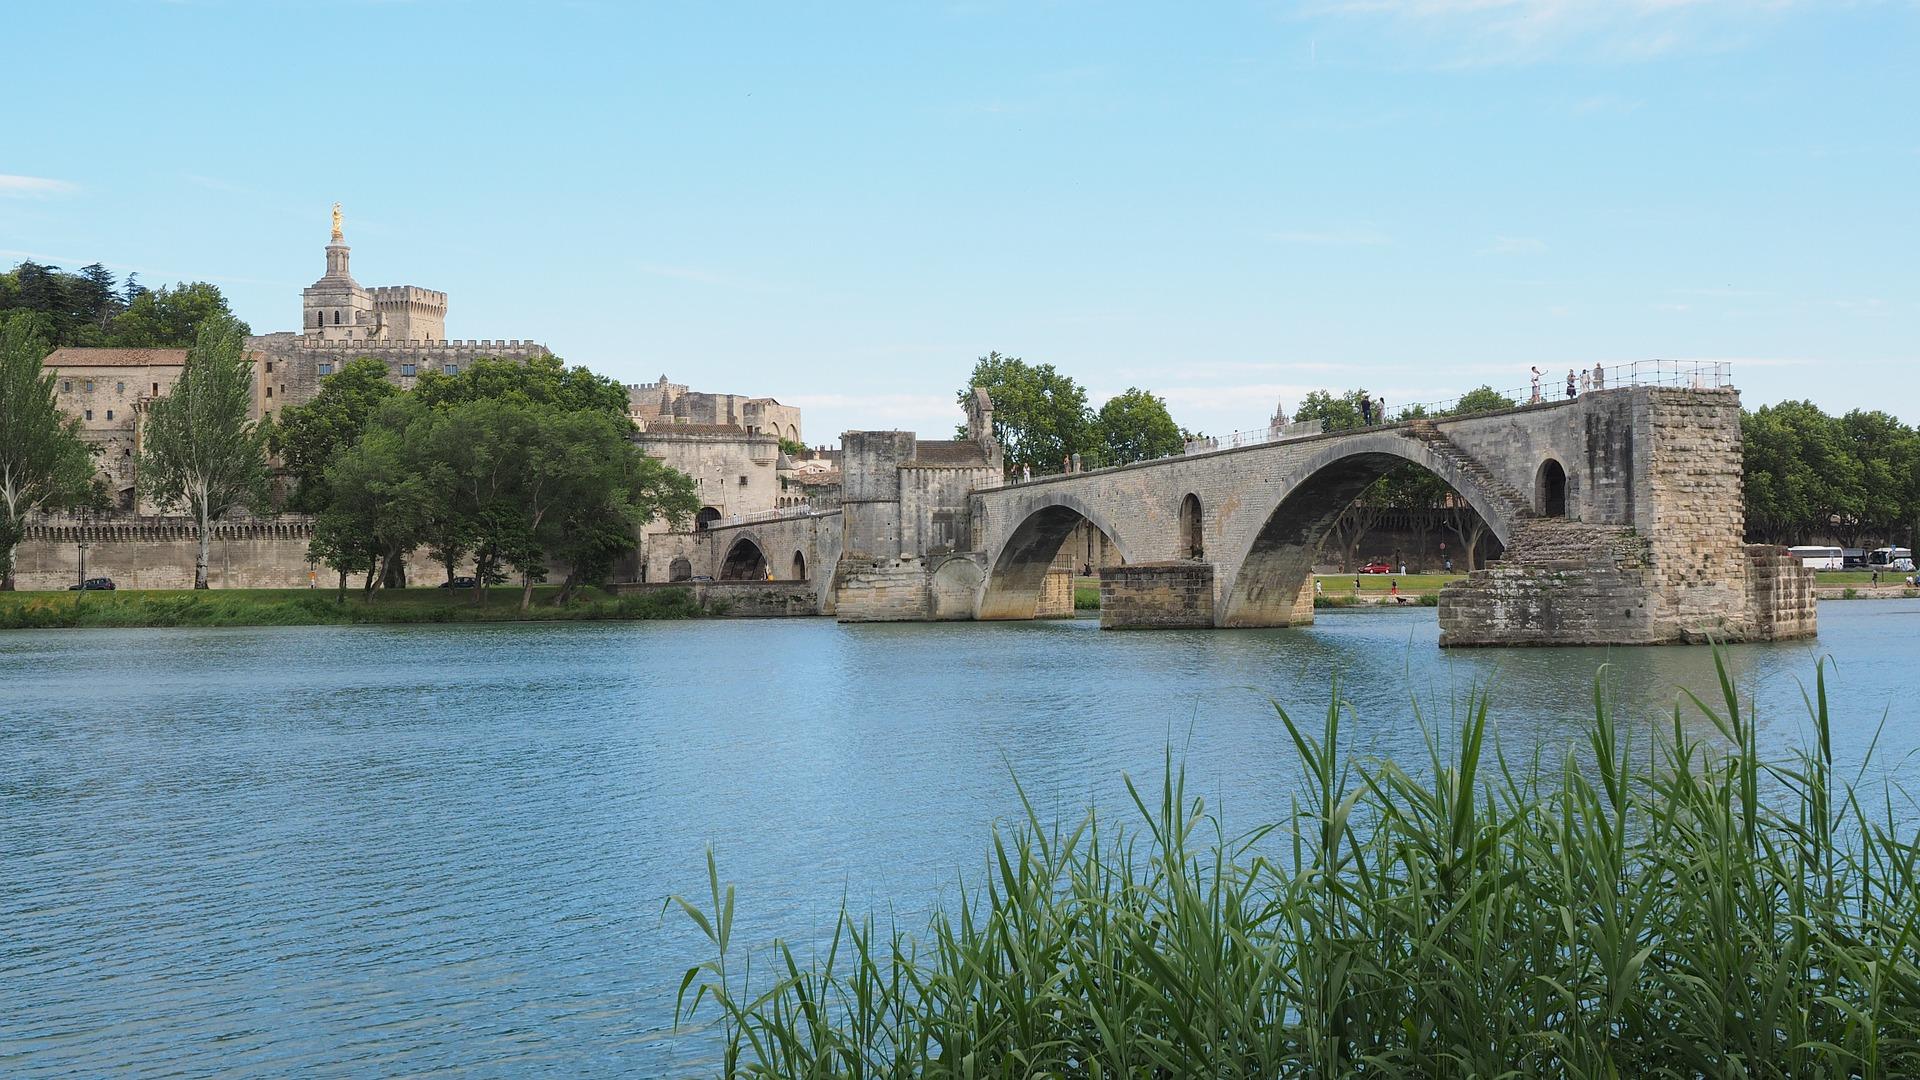 pont-saint-benezet-1521553_1920